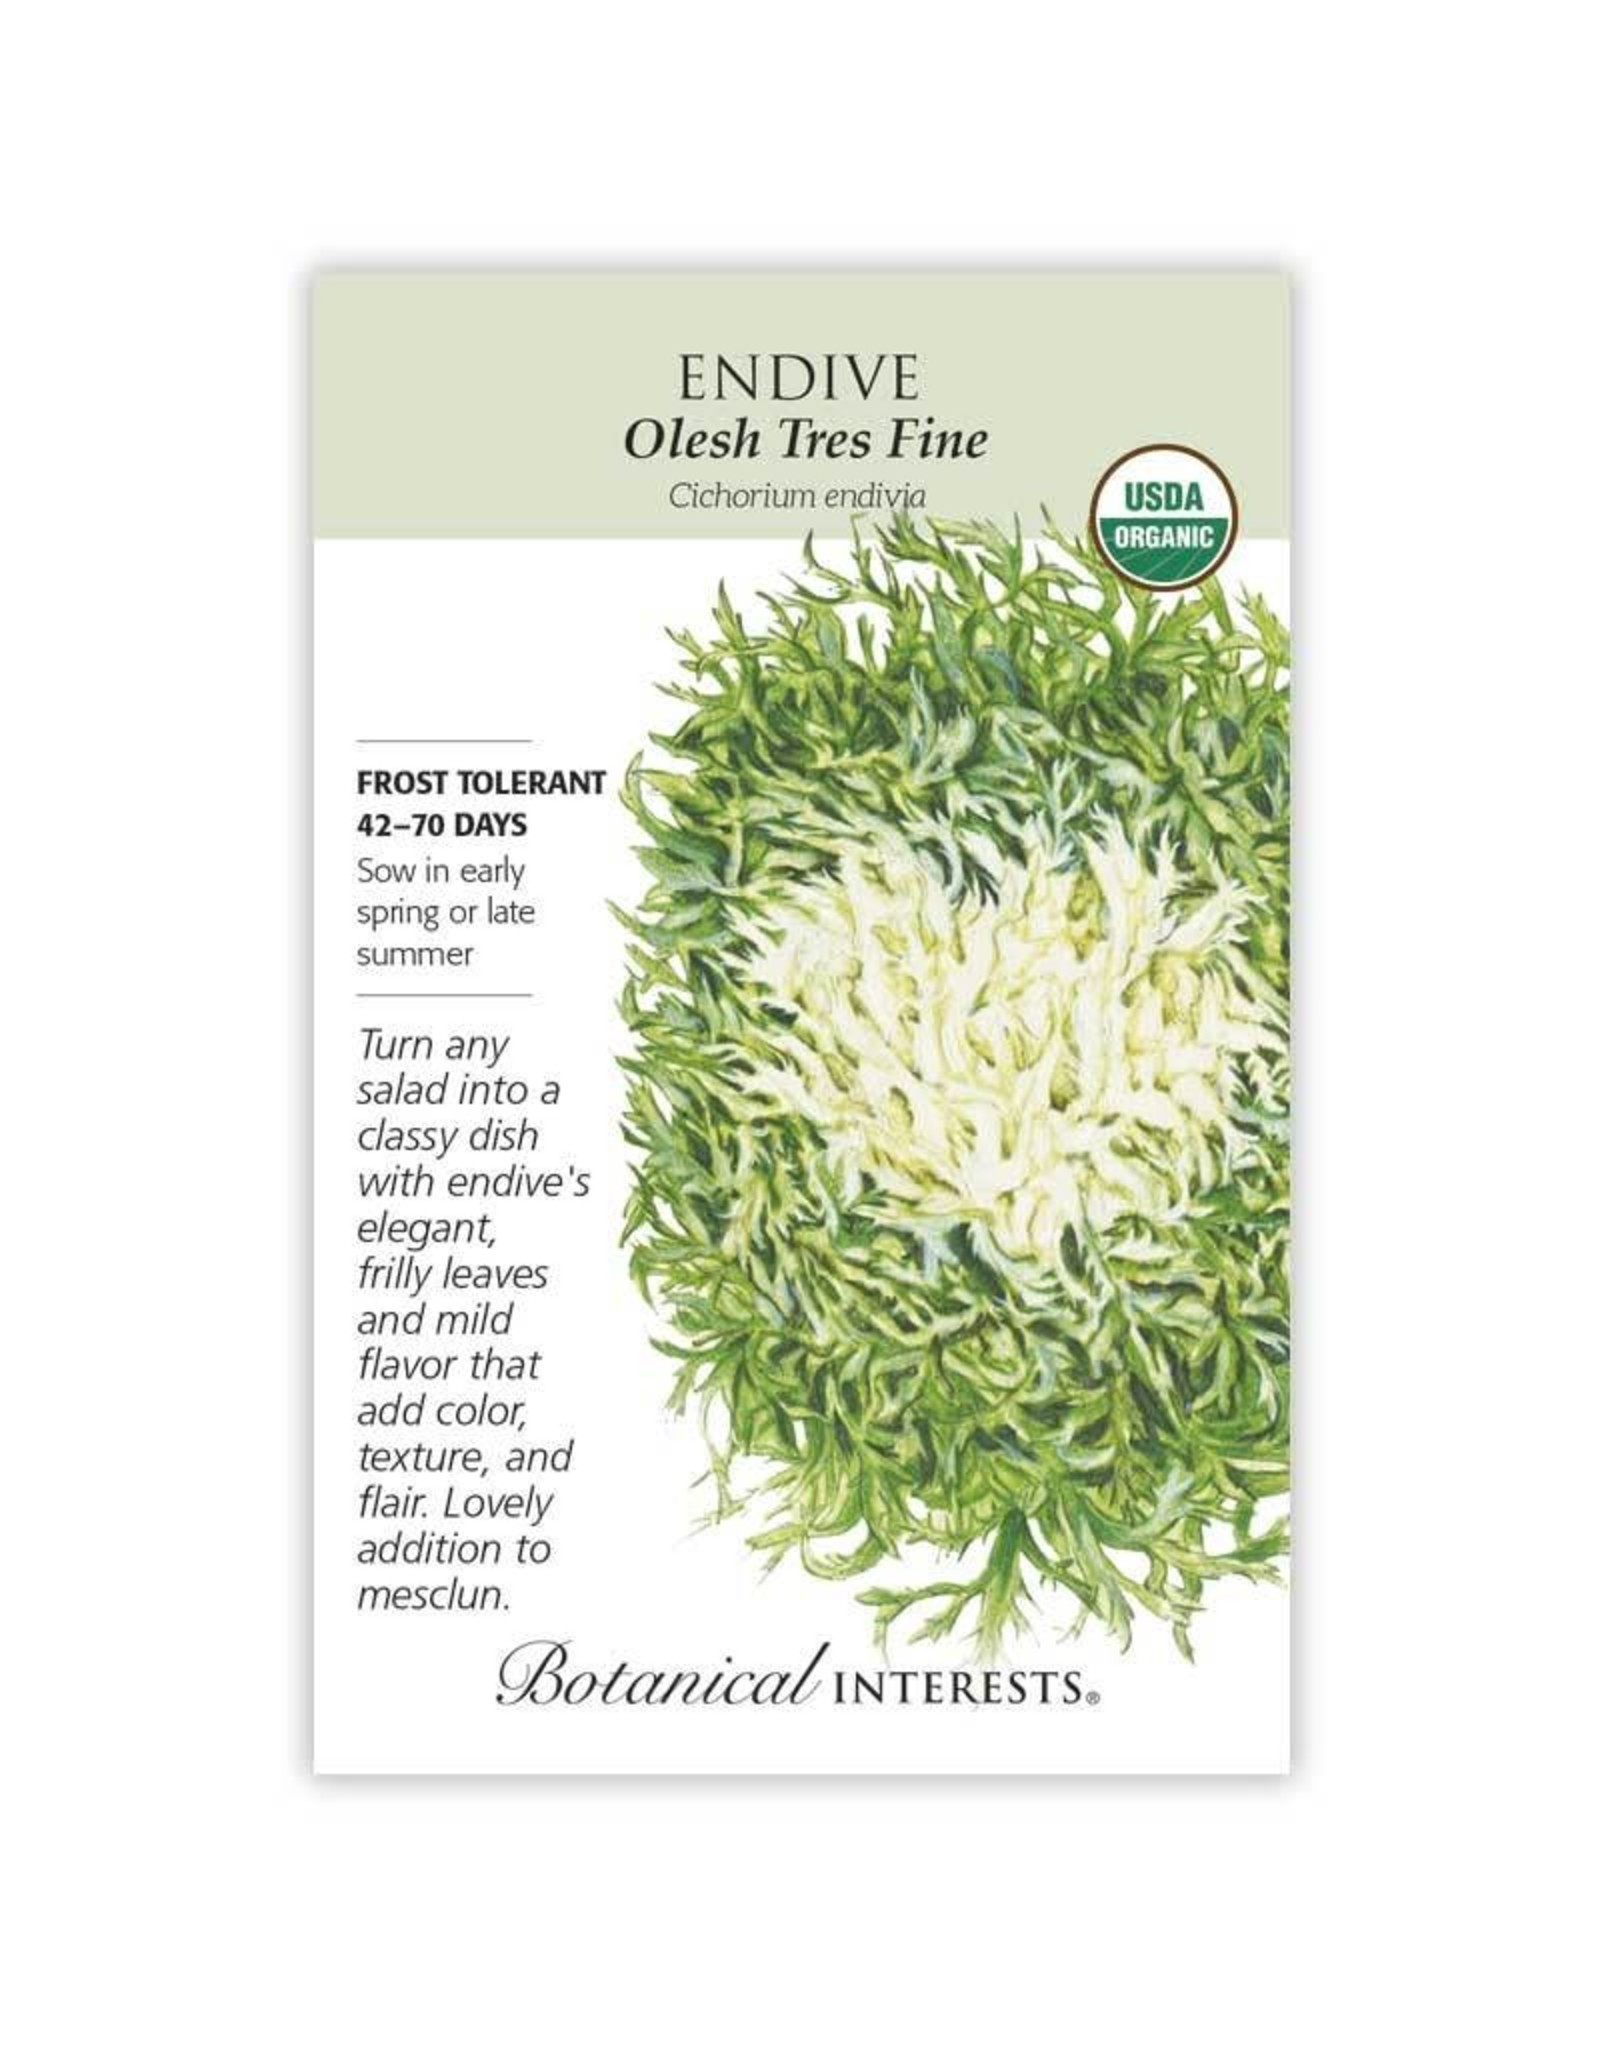 Seeds - Endive Olesh Tres Fine Organic